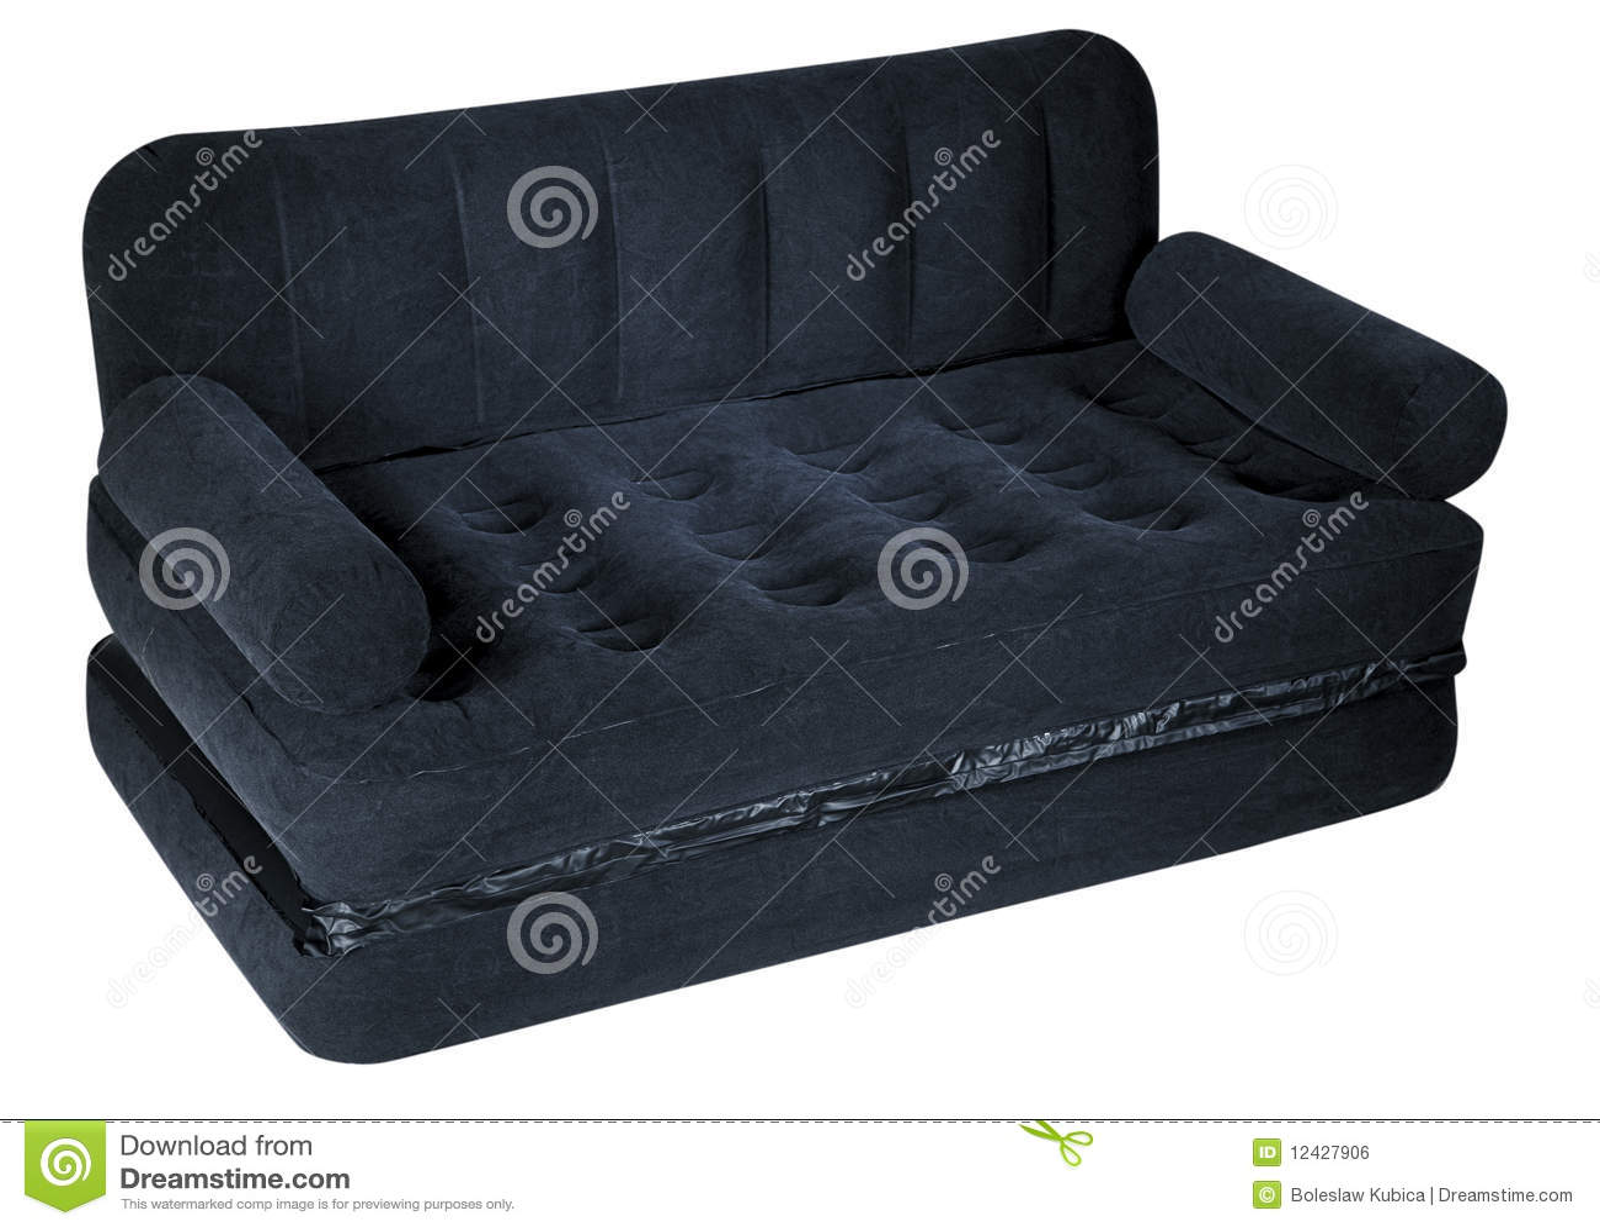 sofa e colchao osasco tosh furniture modern white and black leather sectional sofá colchão de ar imagem stock royalty free